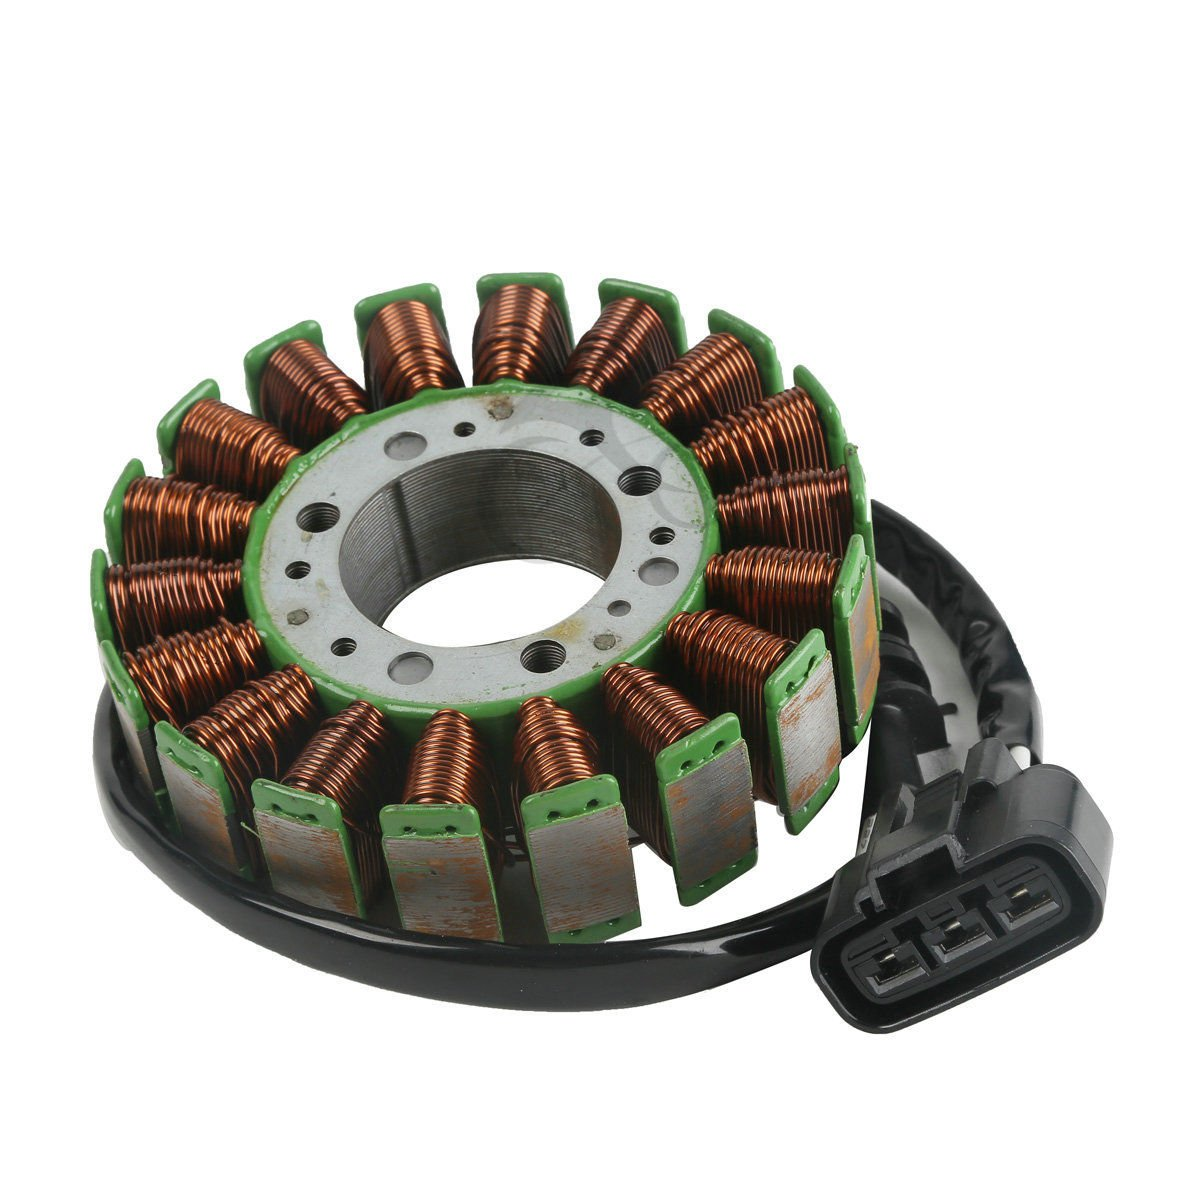 TCMT Magneto Generator Alternator Engine Motor Stator Coil For YAMAHA YZF R1 YZF-R1 2002-2003